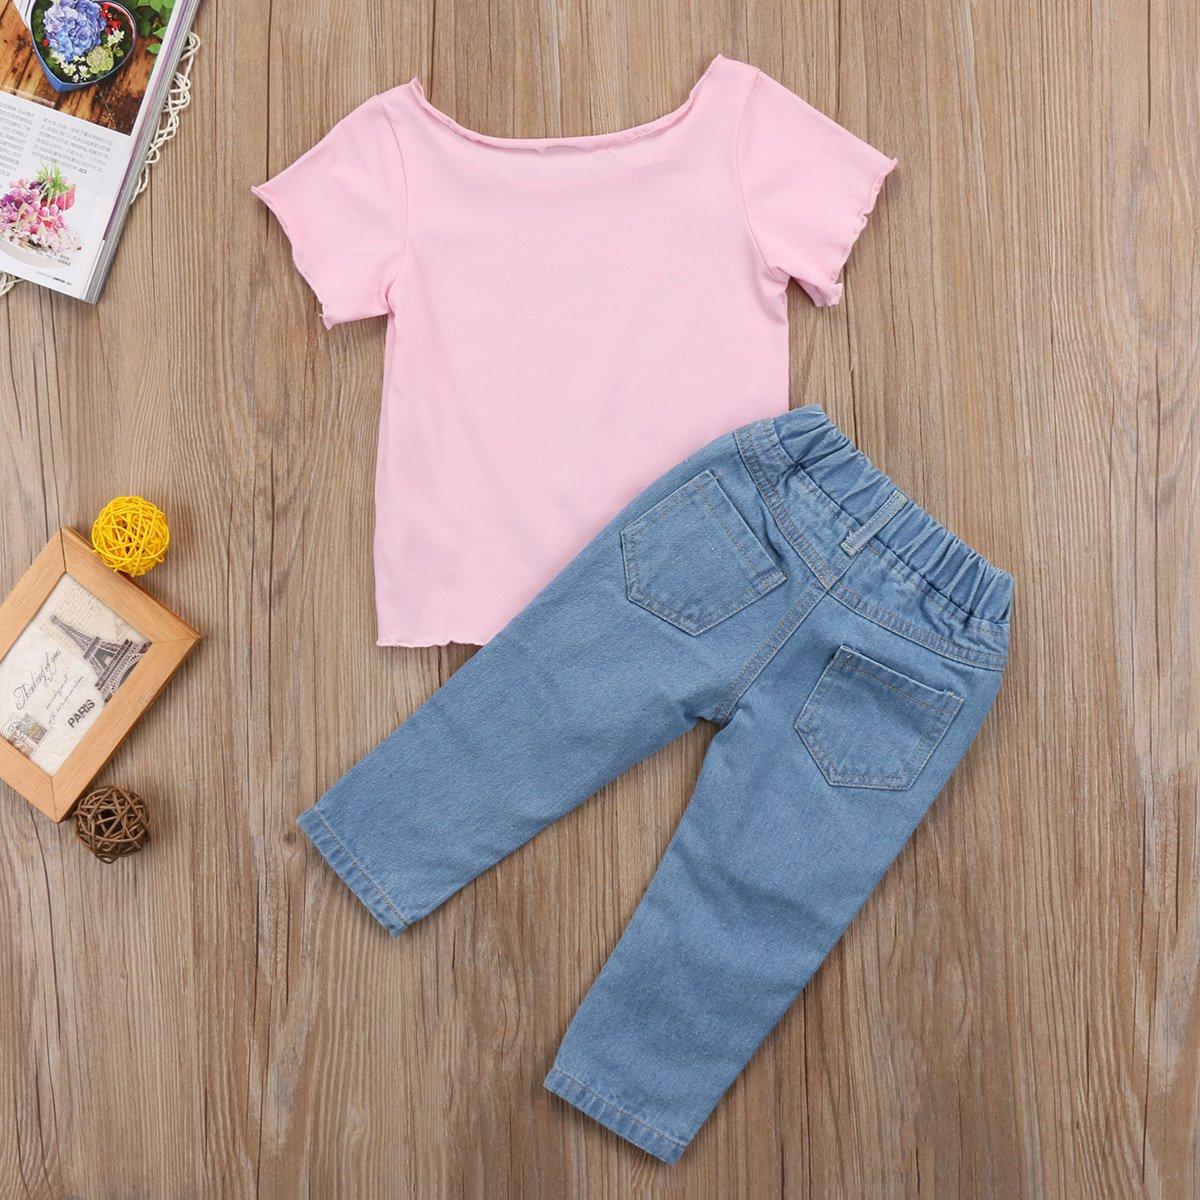 Amazon.com: sunisery niños bebé niñas carta impresión ...